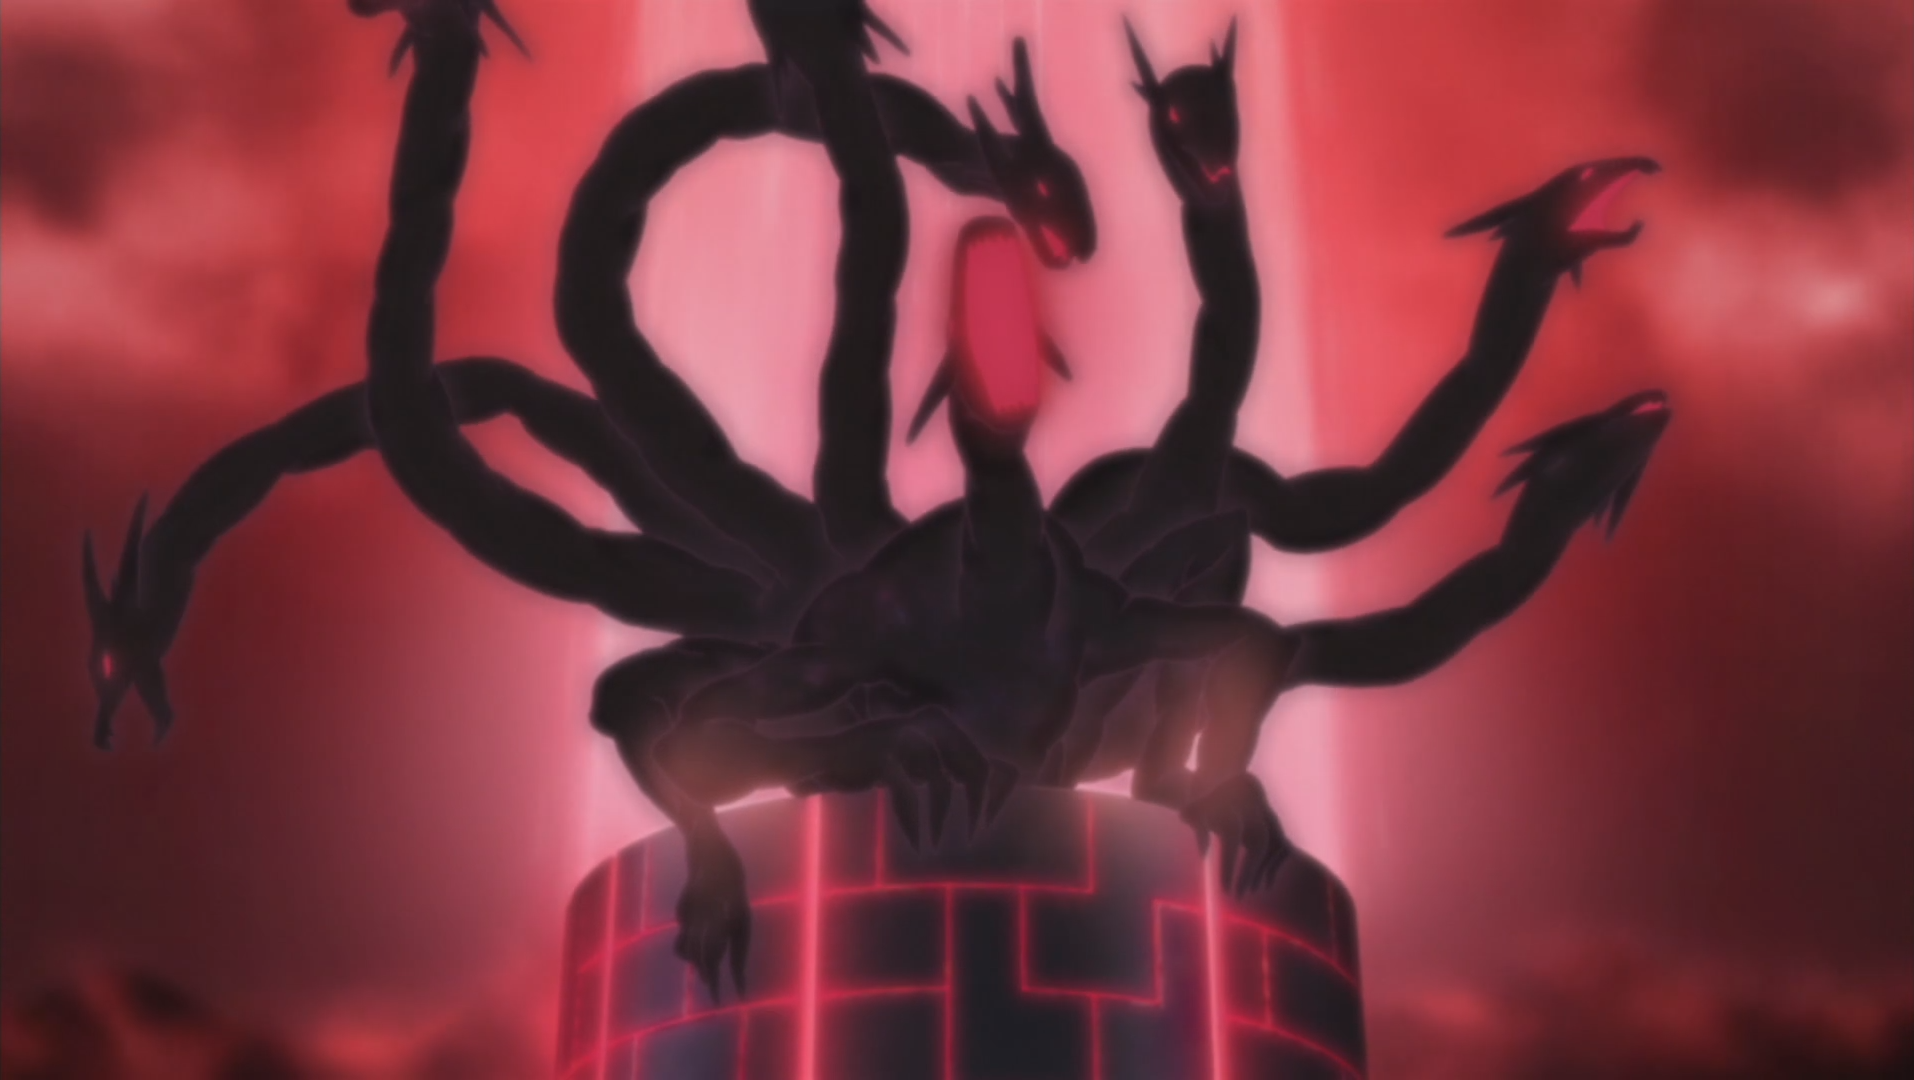 Power - Episode 5 | Narutopedia | FANDOM powered by Wikia